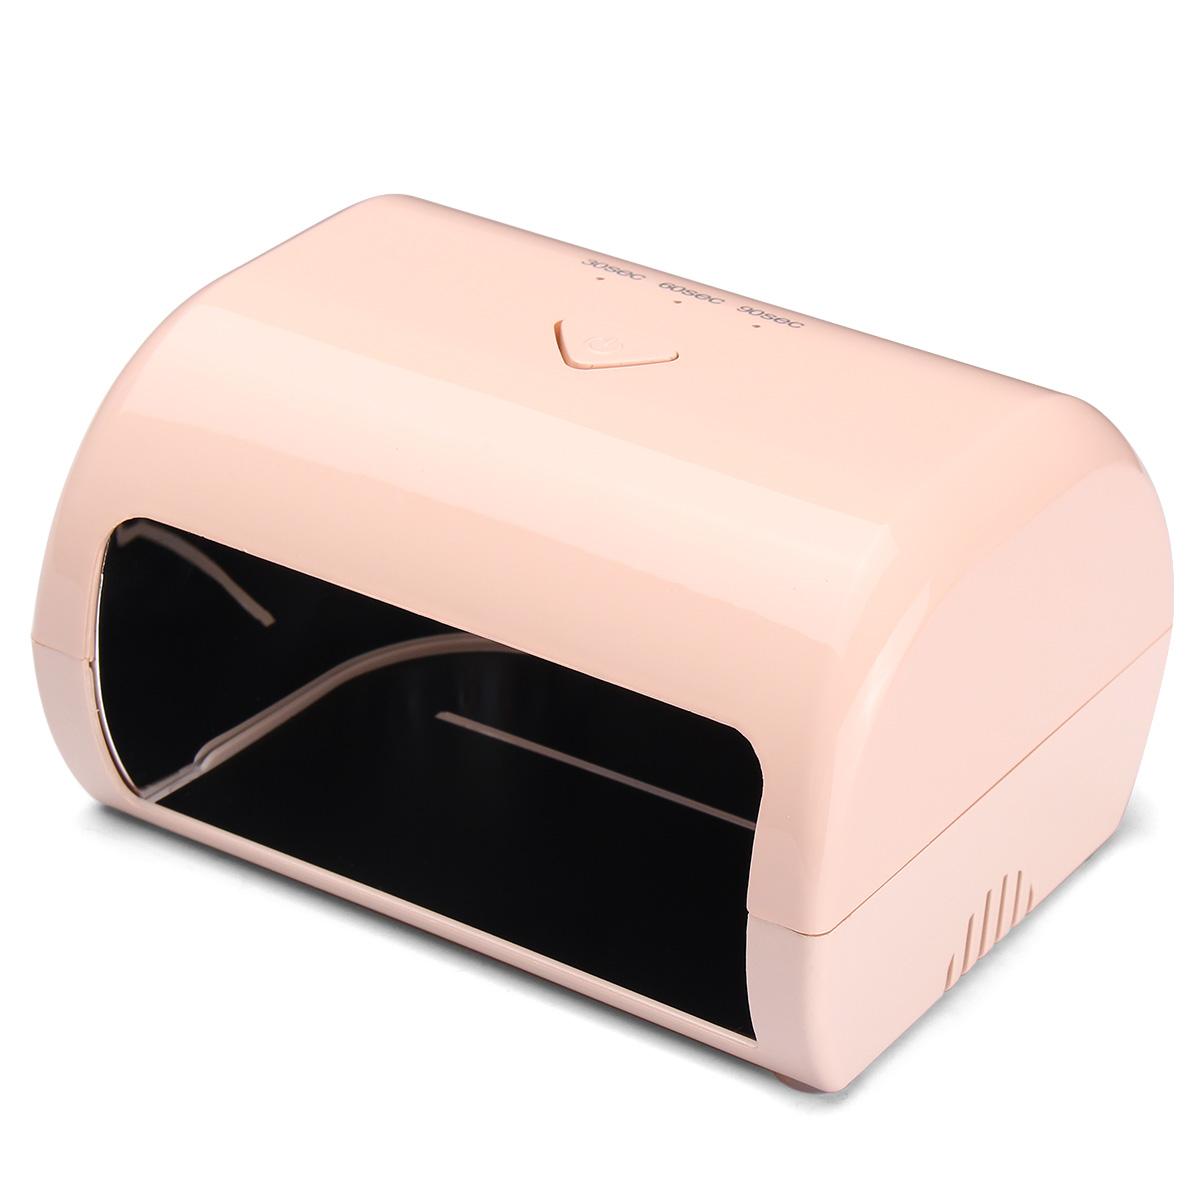 9W LED UV Lamp Nail Art Dryer Machine Gel Polish Curing Manicure Pedicure Salon Tools 110-240V